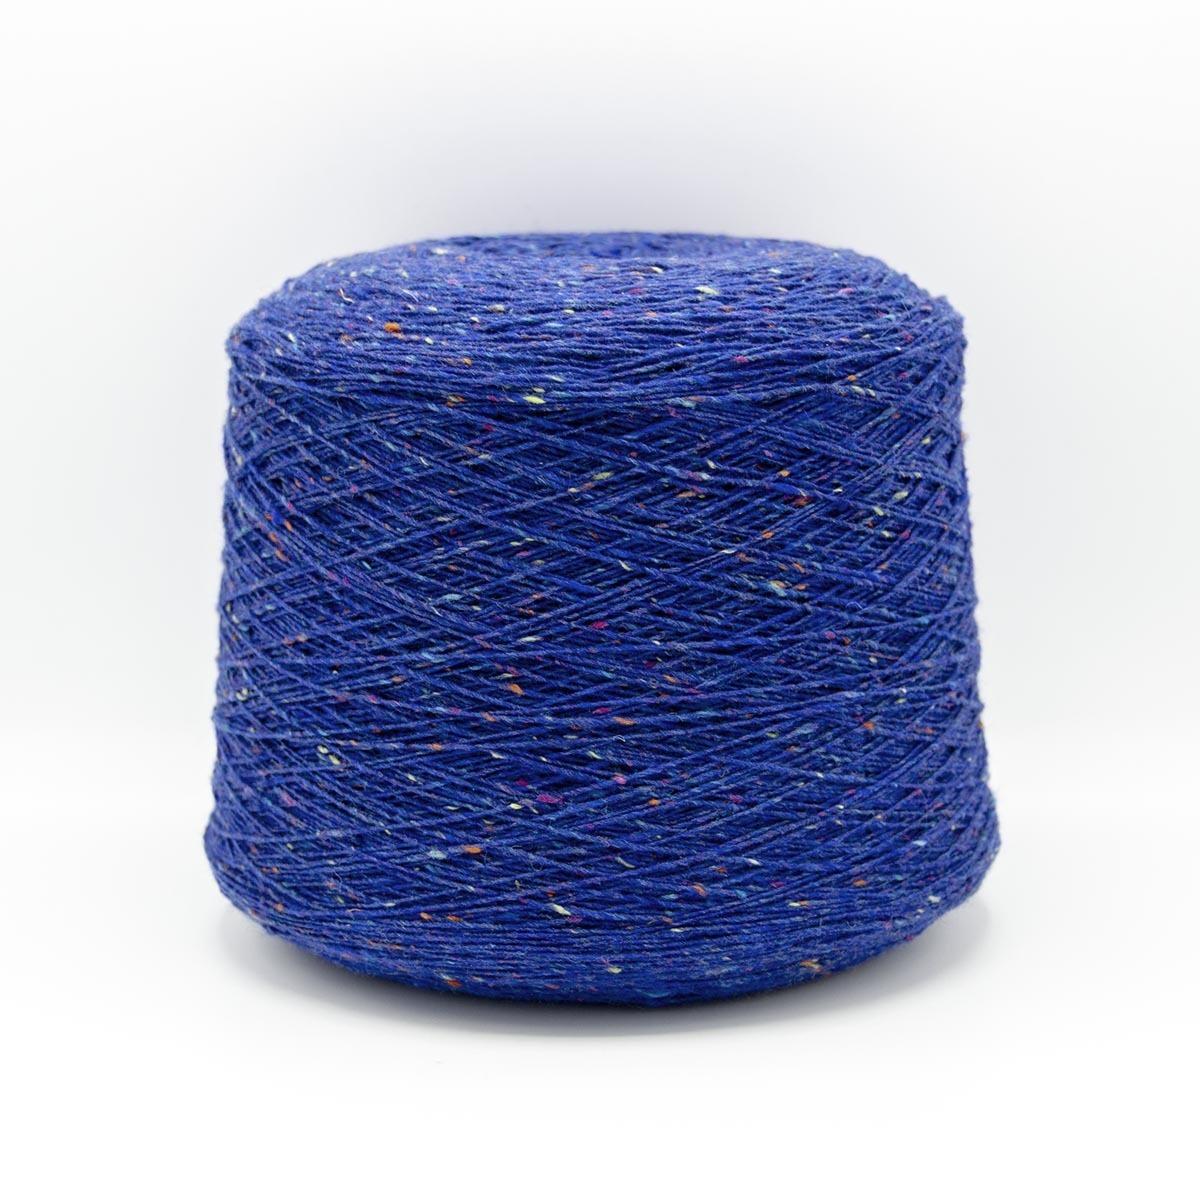 Knoll Yarns Soft Donegal (одинарный твид) - 5565